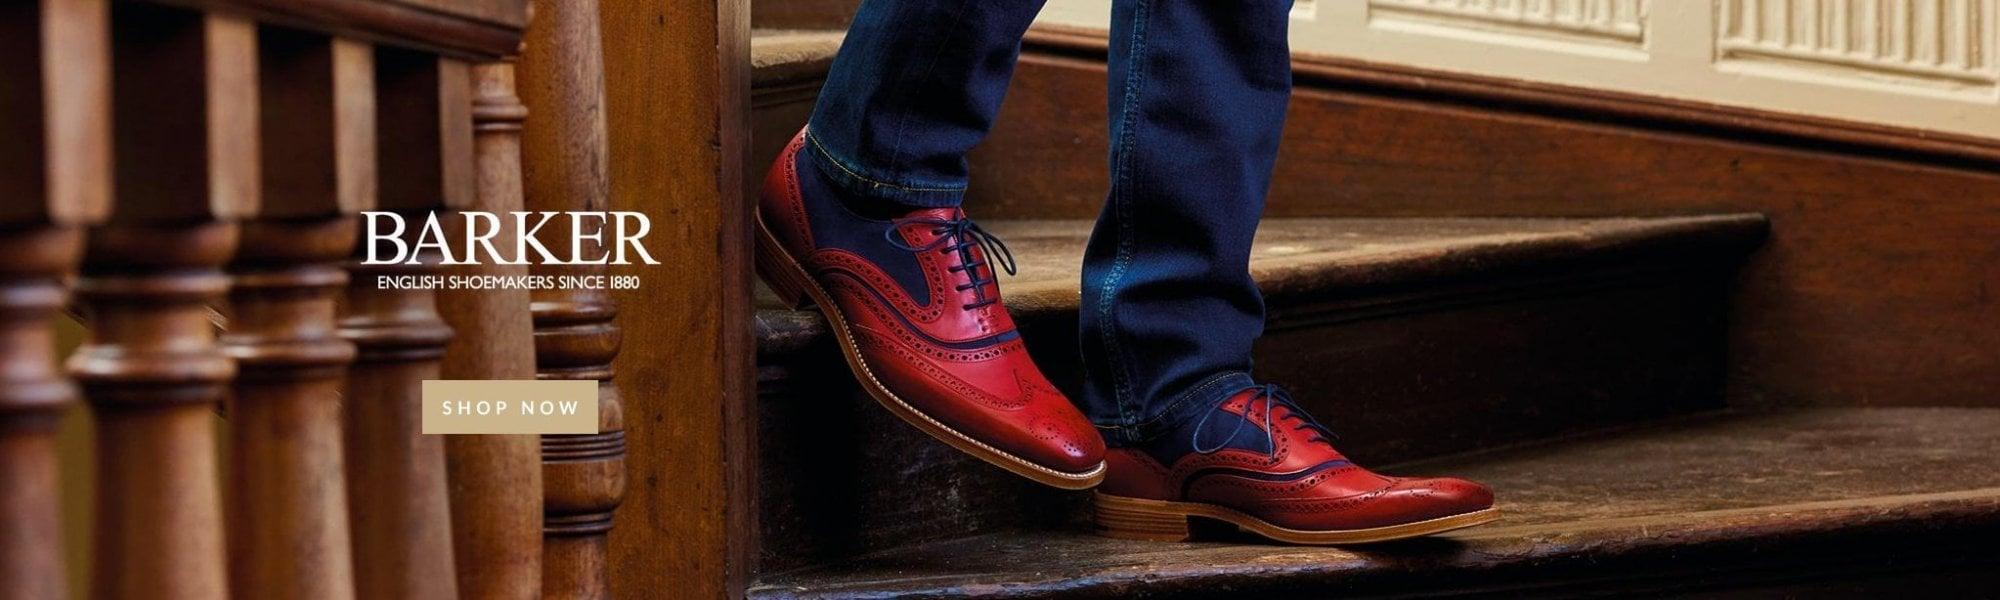 Marshall Shoes Est. 1895 - Womens, Mens